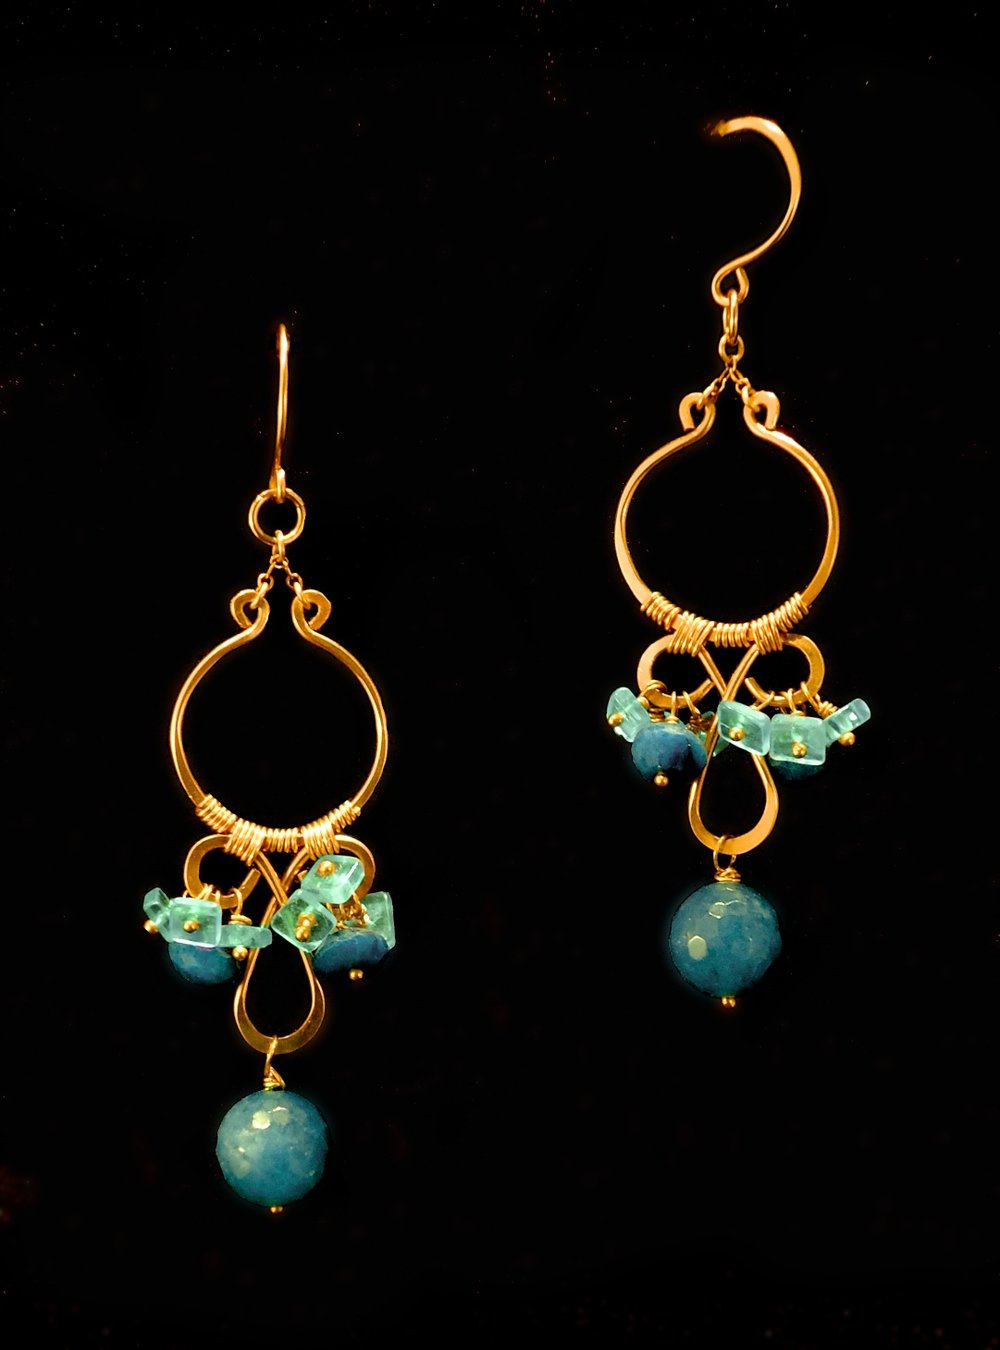 Chrysocolla & Aquamarine Chandeliers